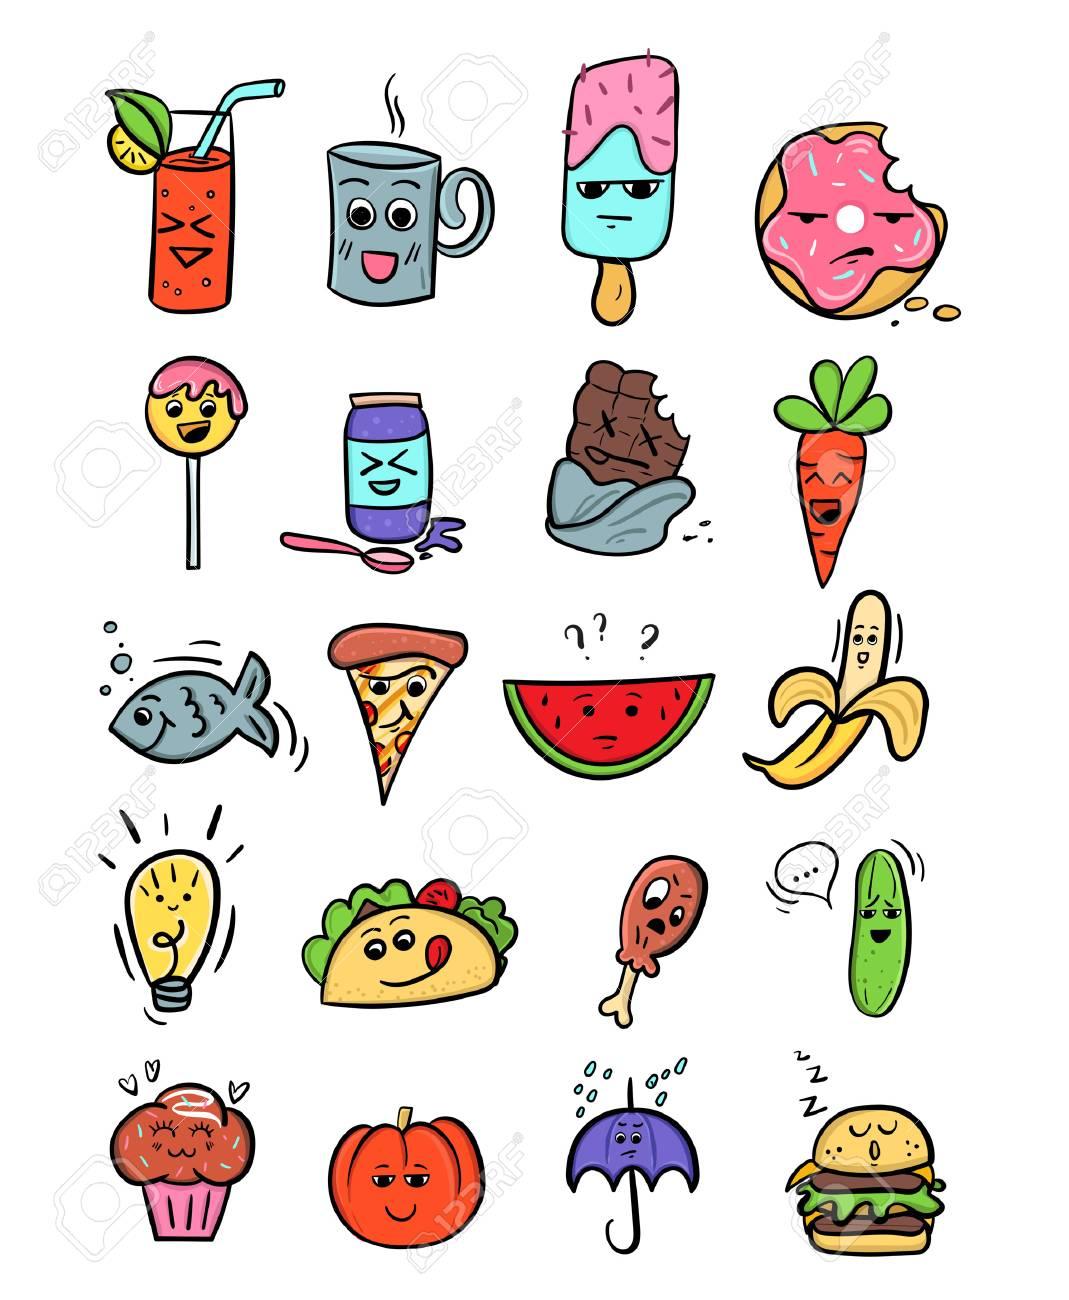 Kawaii Food Set Fastfood Cartoon Illustrations Hand Drawn Doodles Royalty Free Cliparts Vectors And Stock Illustration Image 90827861